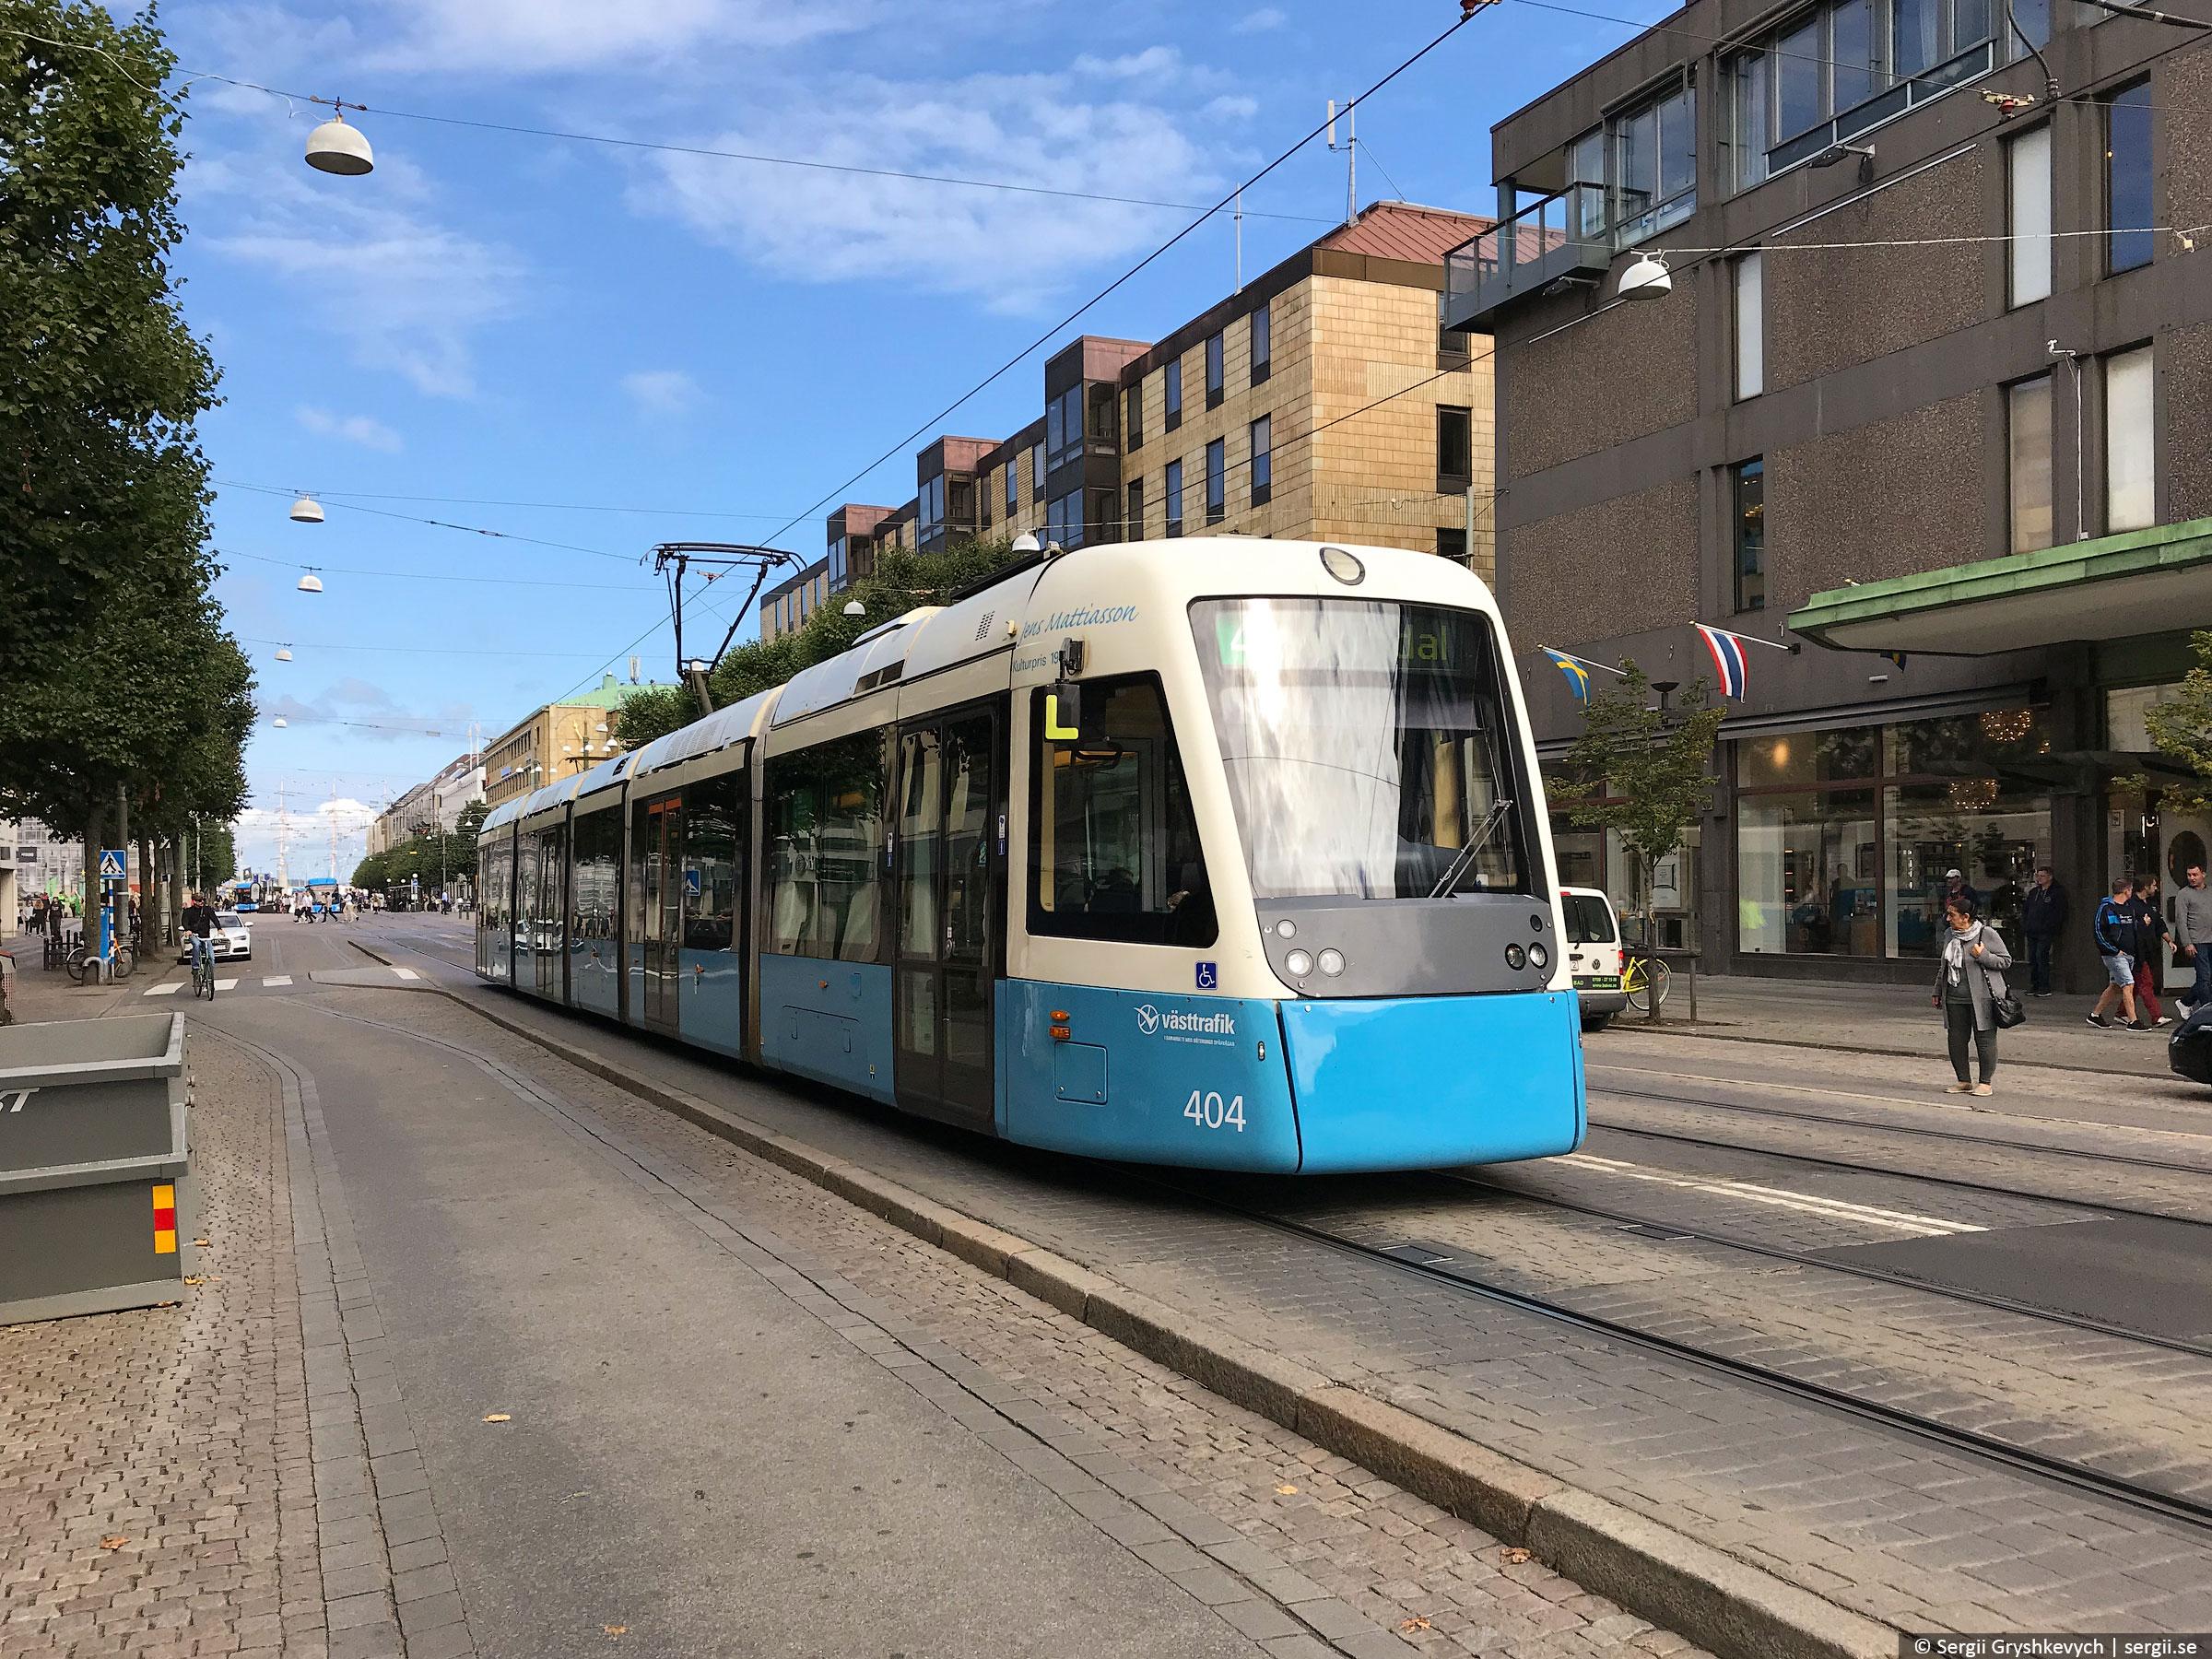 göteborg-ghotenburg-sweden-2018-15